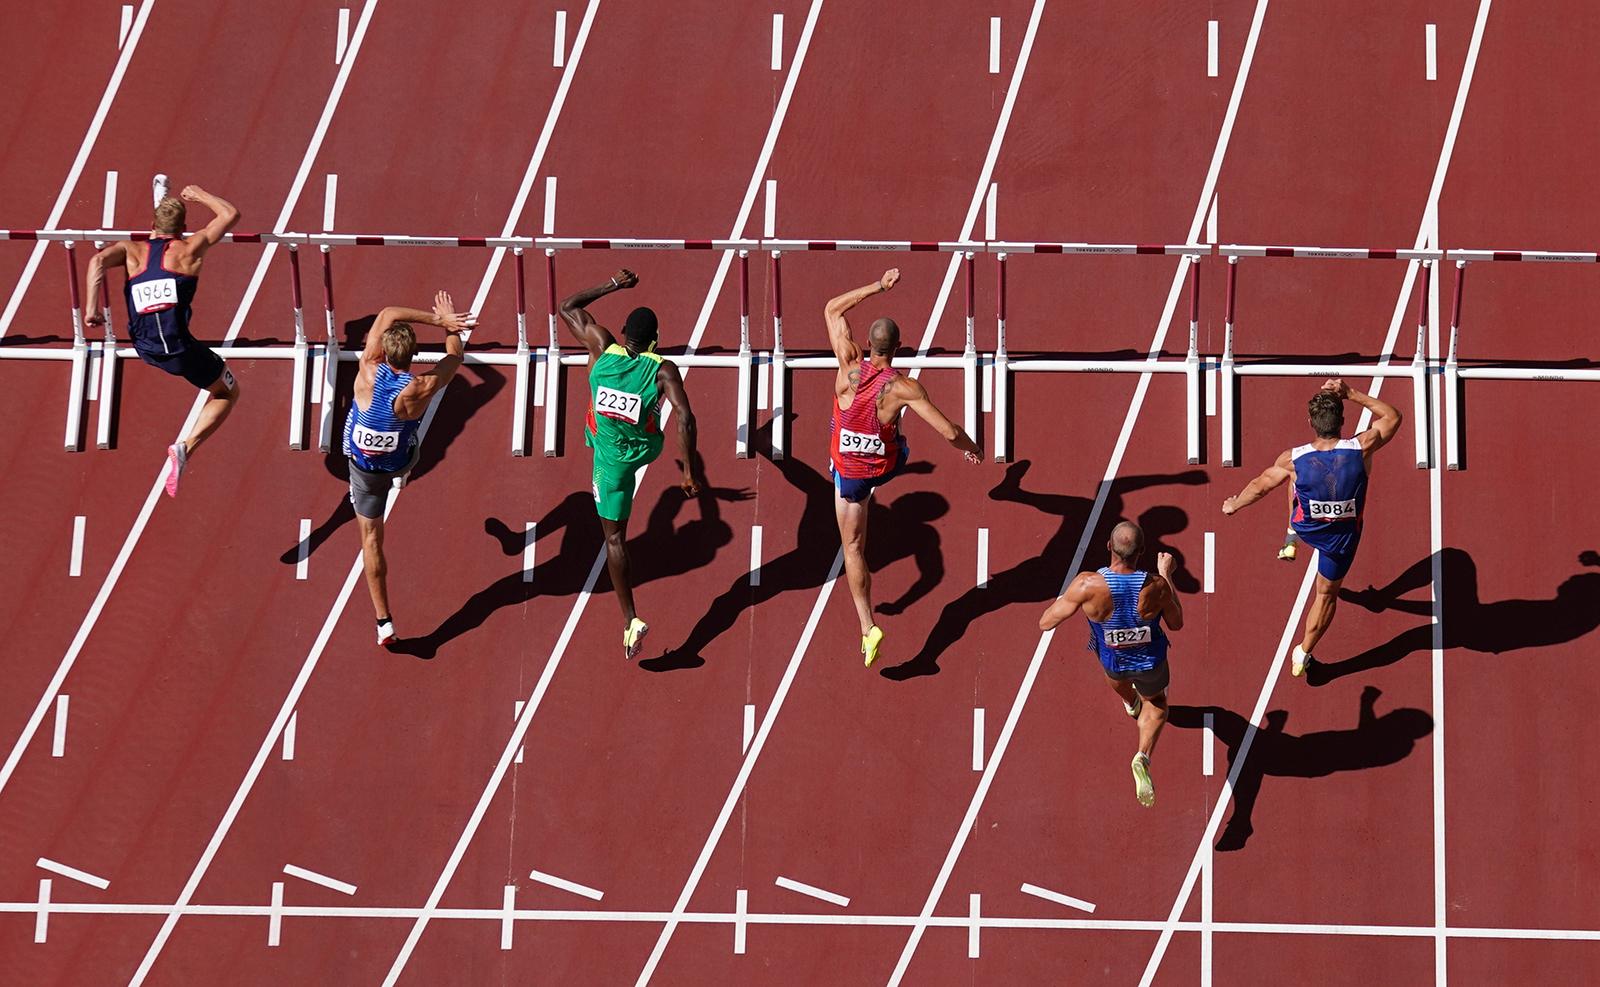 Tokyo 2020 Olympics - Athletics - Men's 110m Hurdles - Decathlon 110m Hurdles - Olympic Stadium, Tokyo, Japan - August 5, 2021. General view of athletes in action during Heat 1. REUTERS